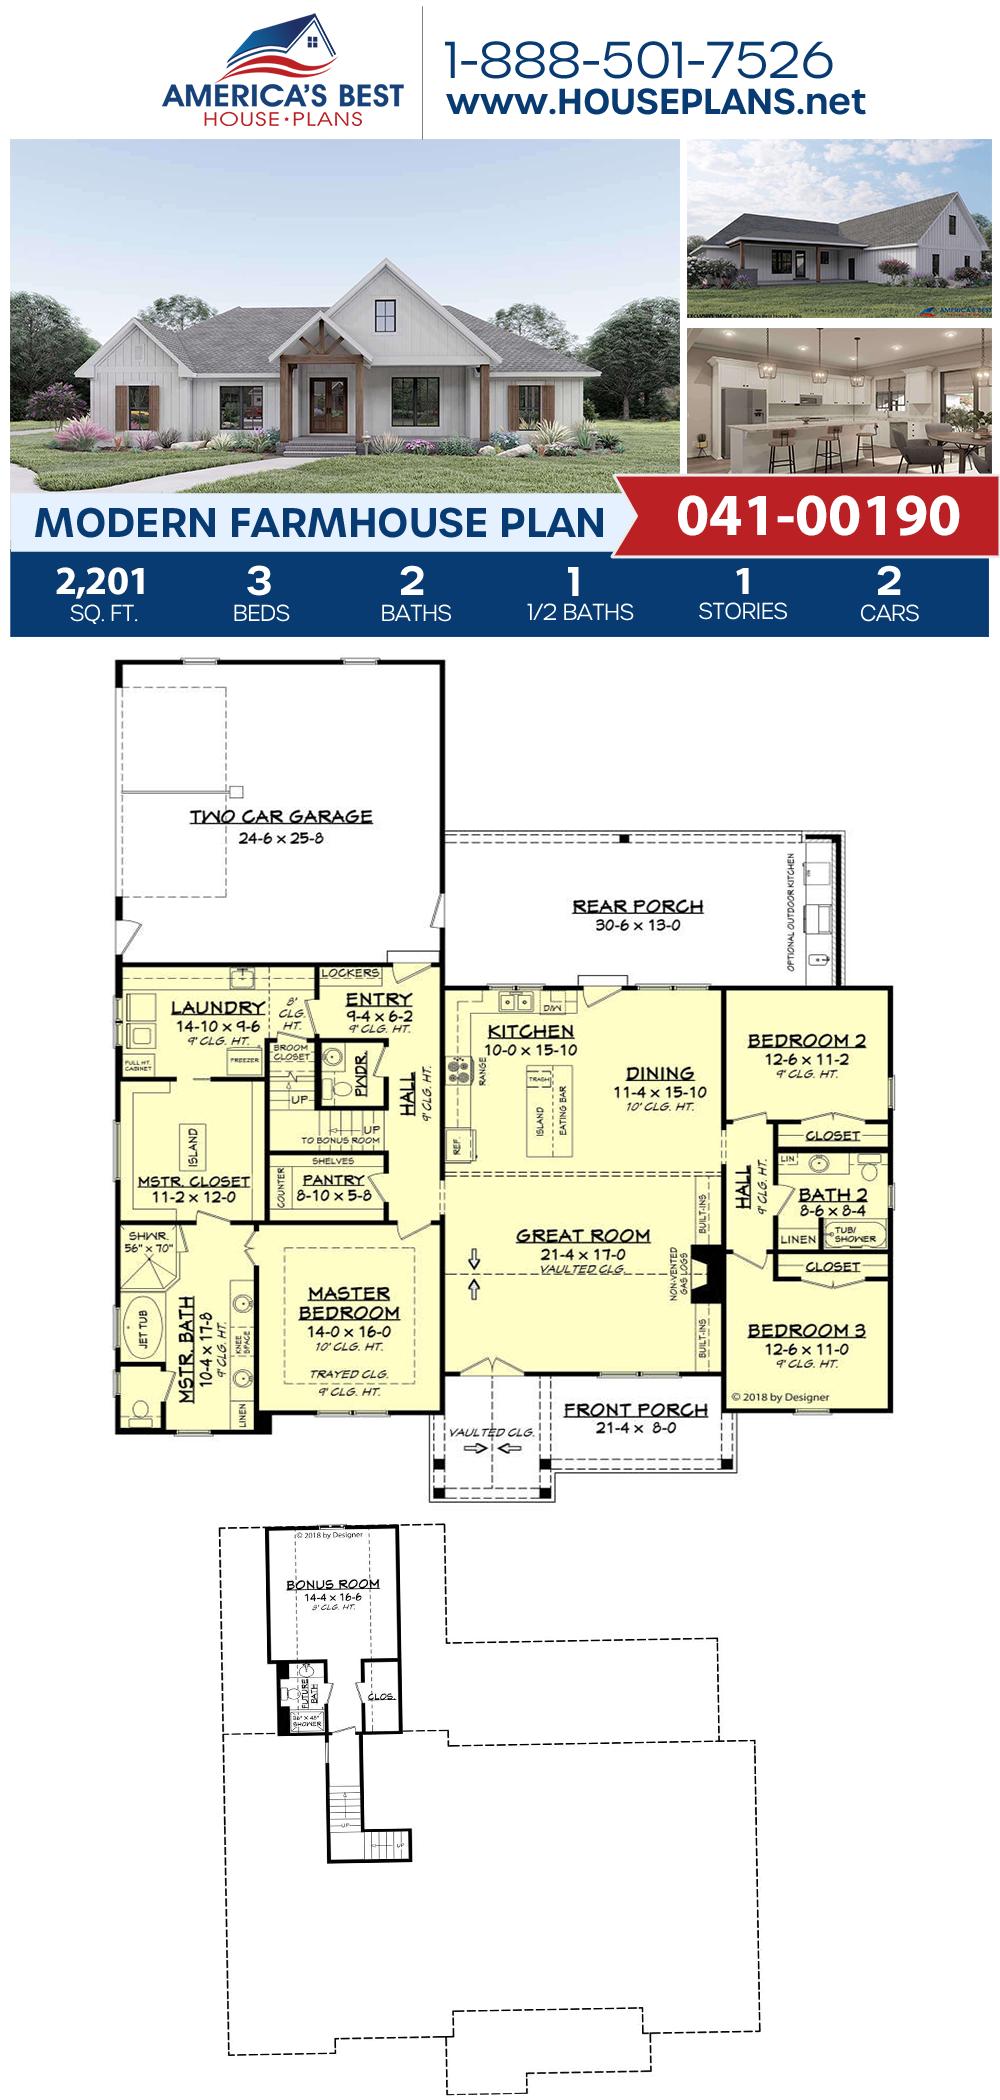 House Plan 041 00190 Modern Farmhouse Plan 2 201 Square Feet 3 Bedrooms 2 5 Bathrooms In 2020 Modern Farmhouse Plans Farmhouse Plans House Plans Farmhouse